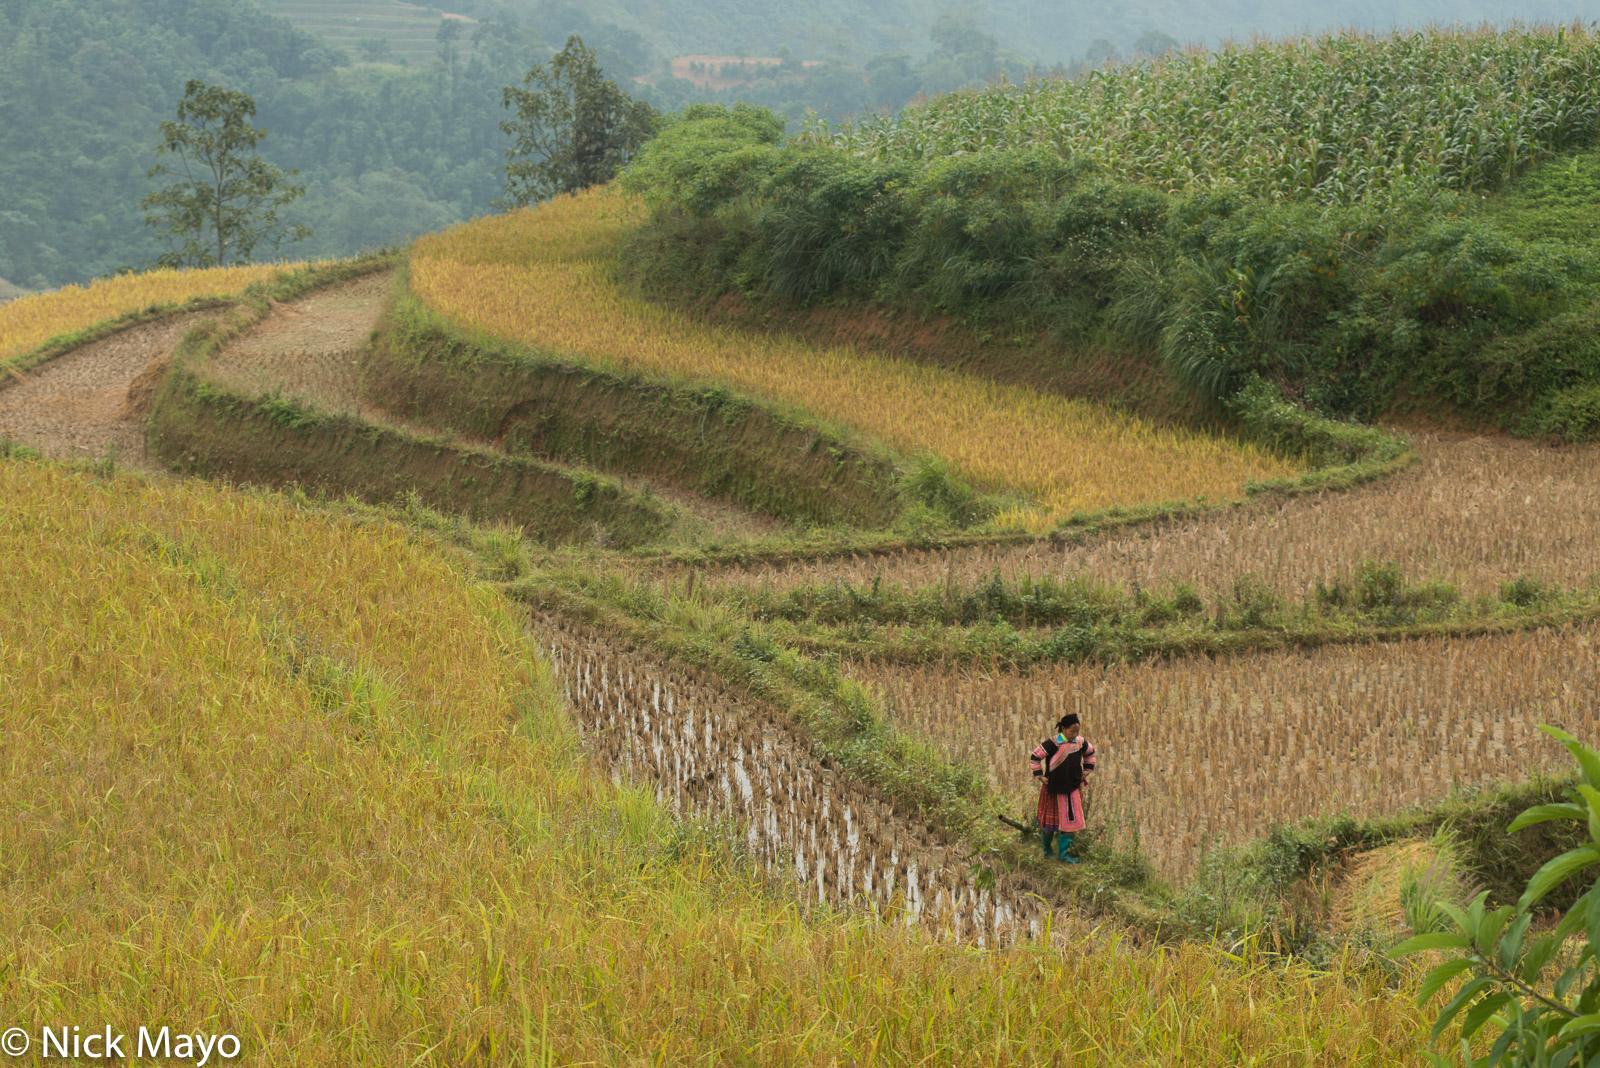 Apron, Ha Giang, Miao, Paddy, Vietnam, photo